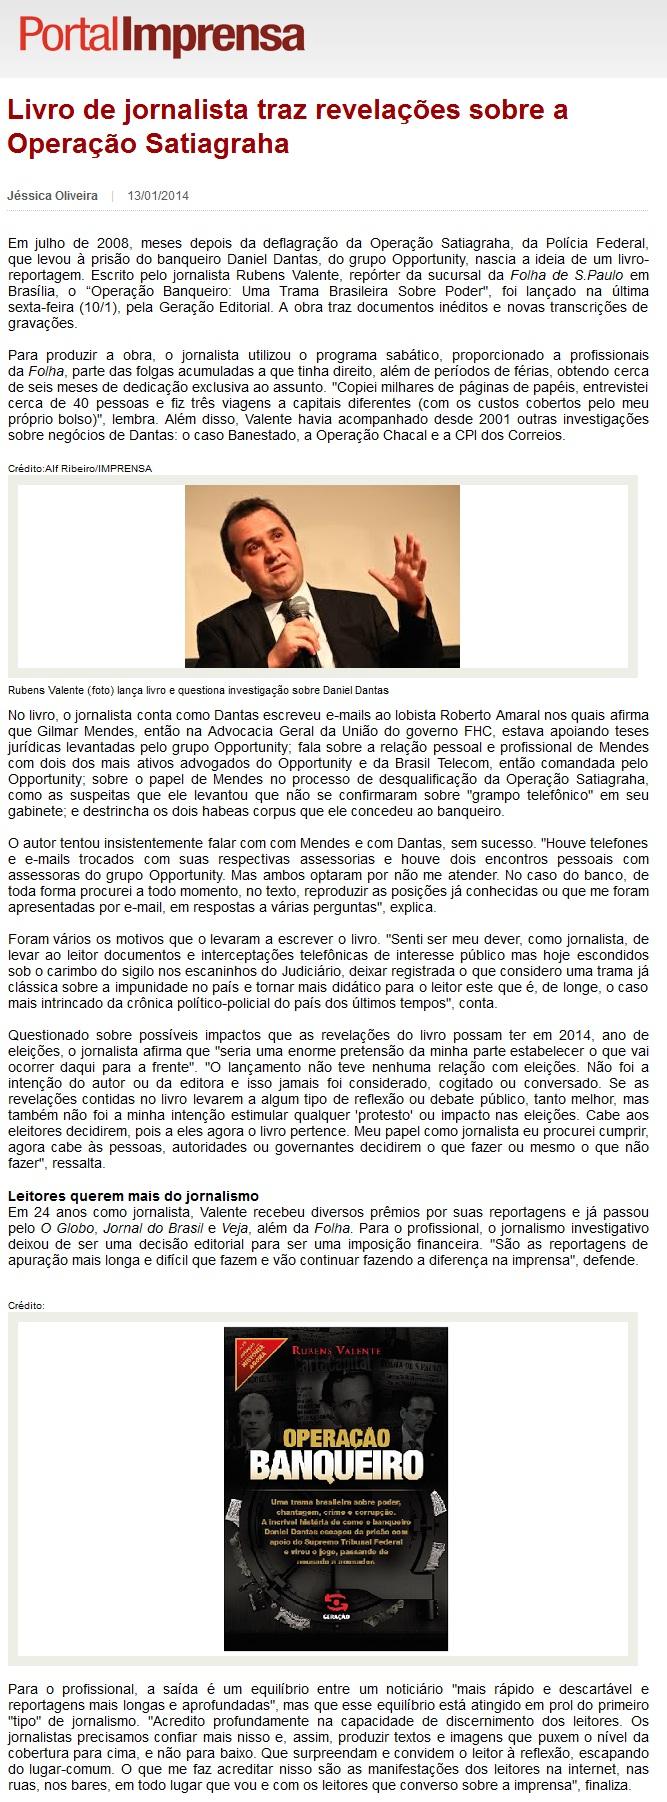 Portal Imprensa_13.01.2014